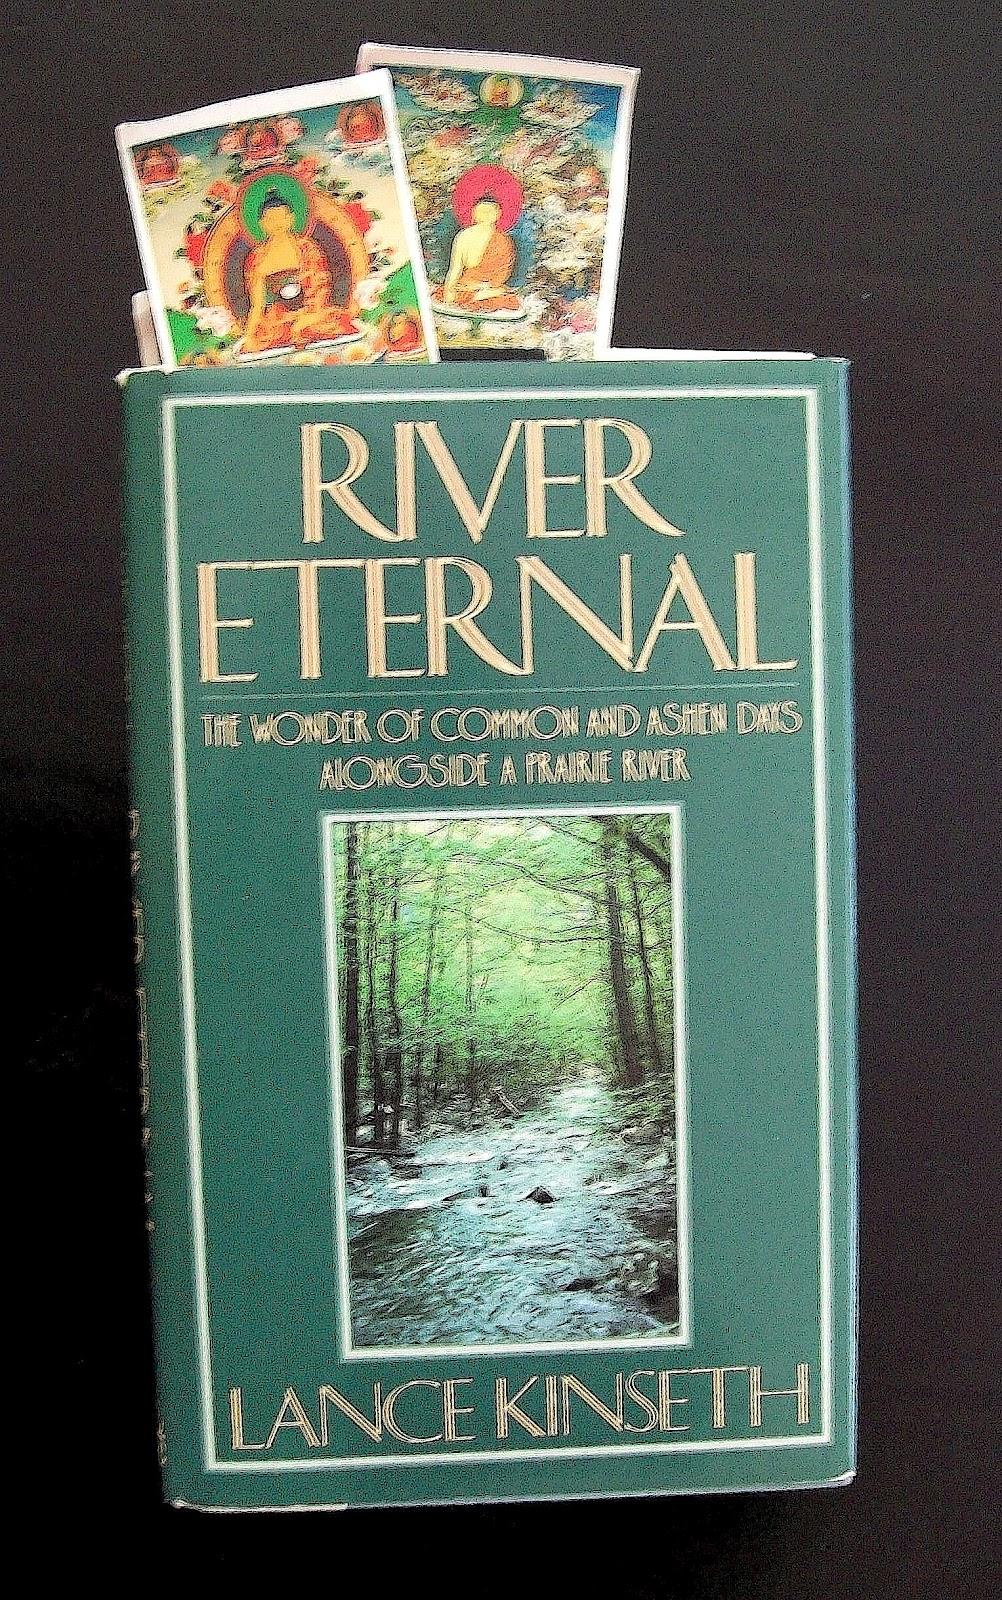 River Eternal (Viking, 1989)